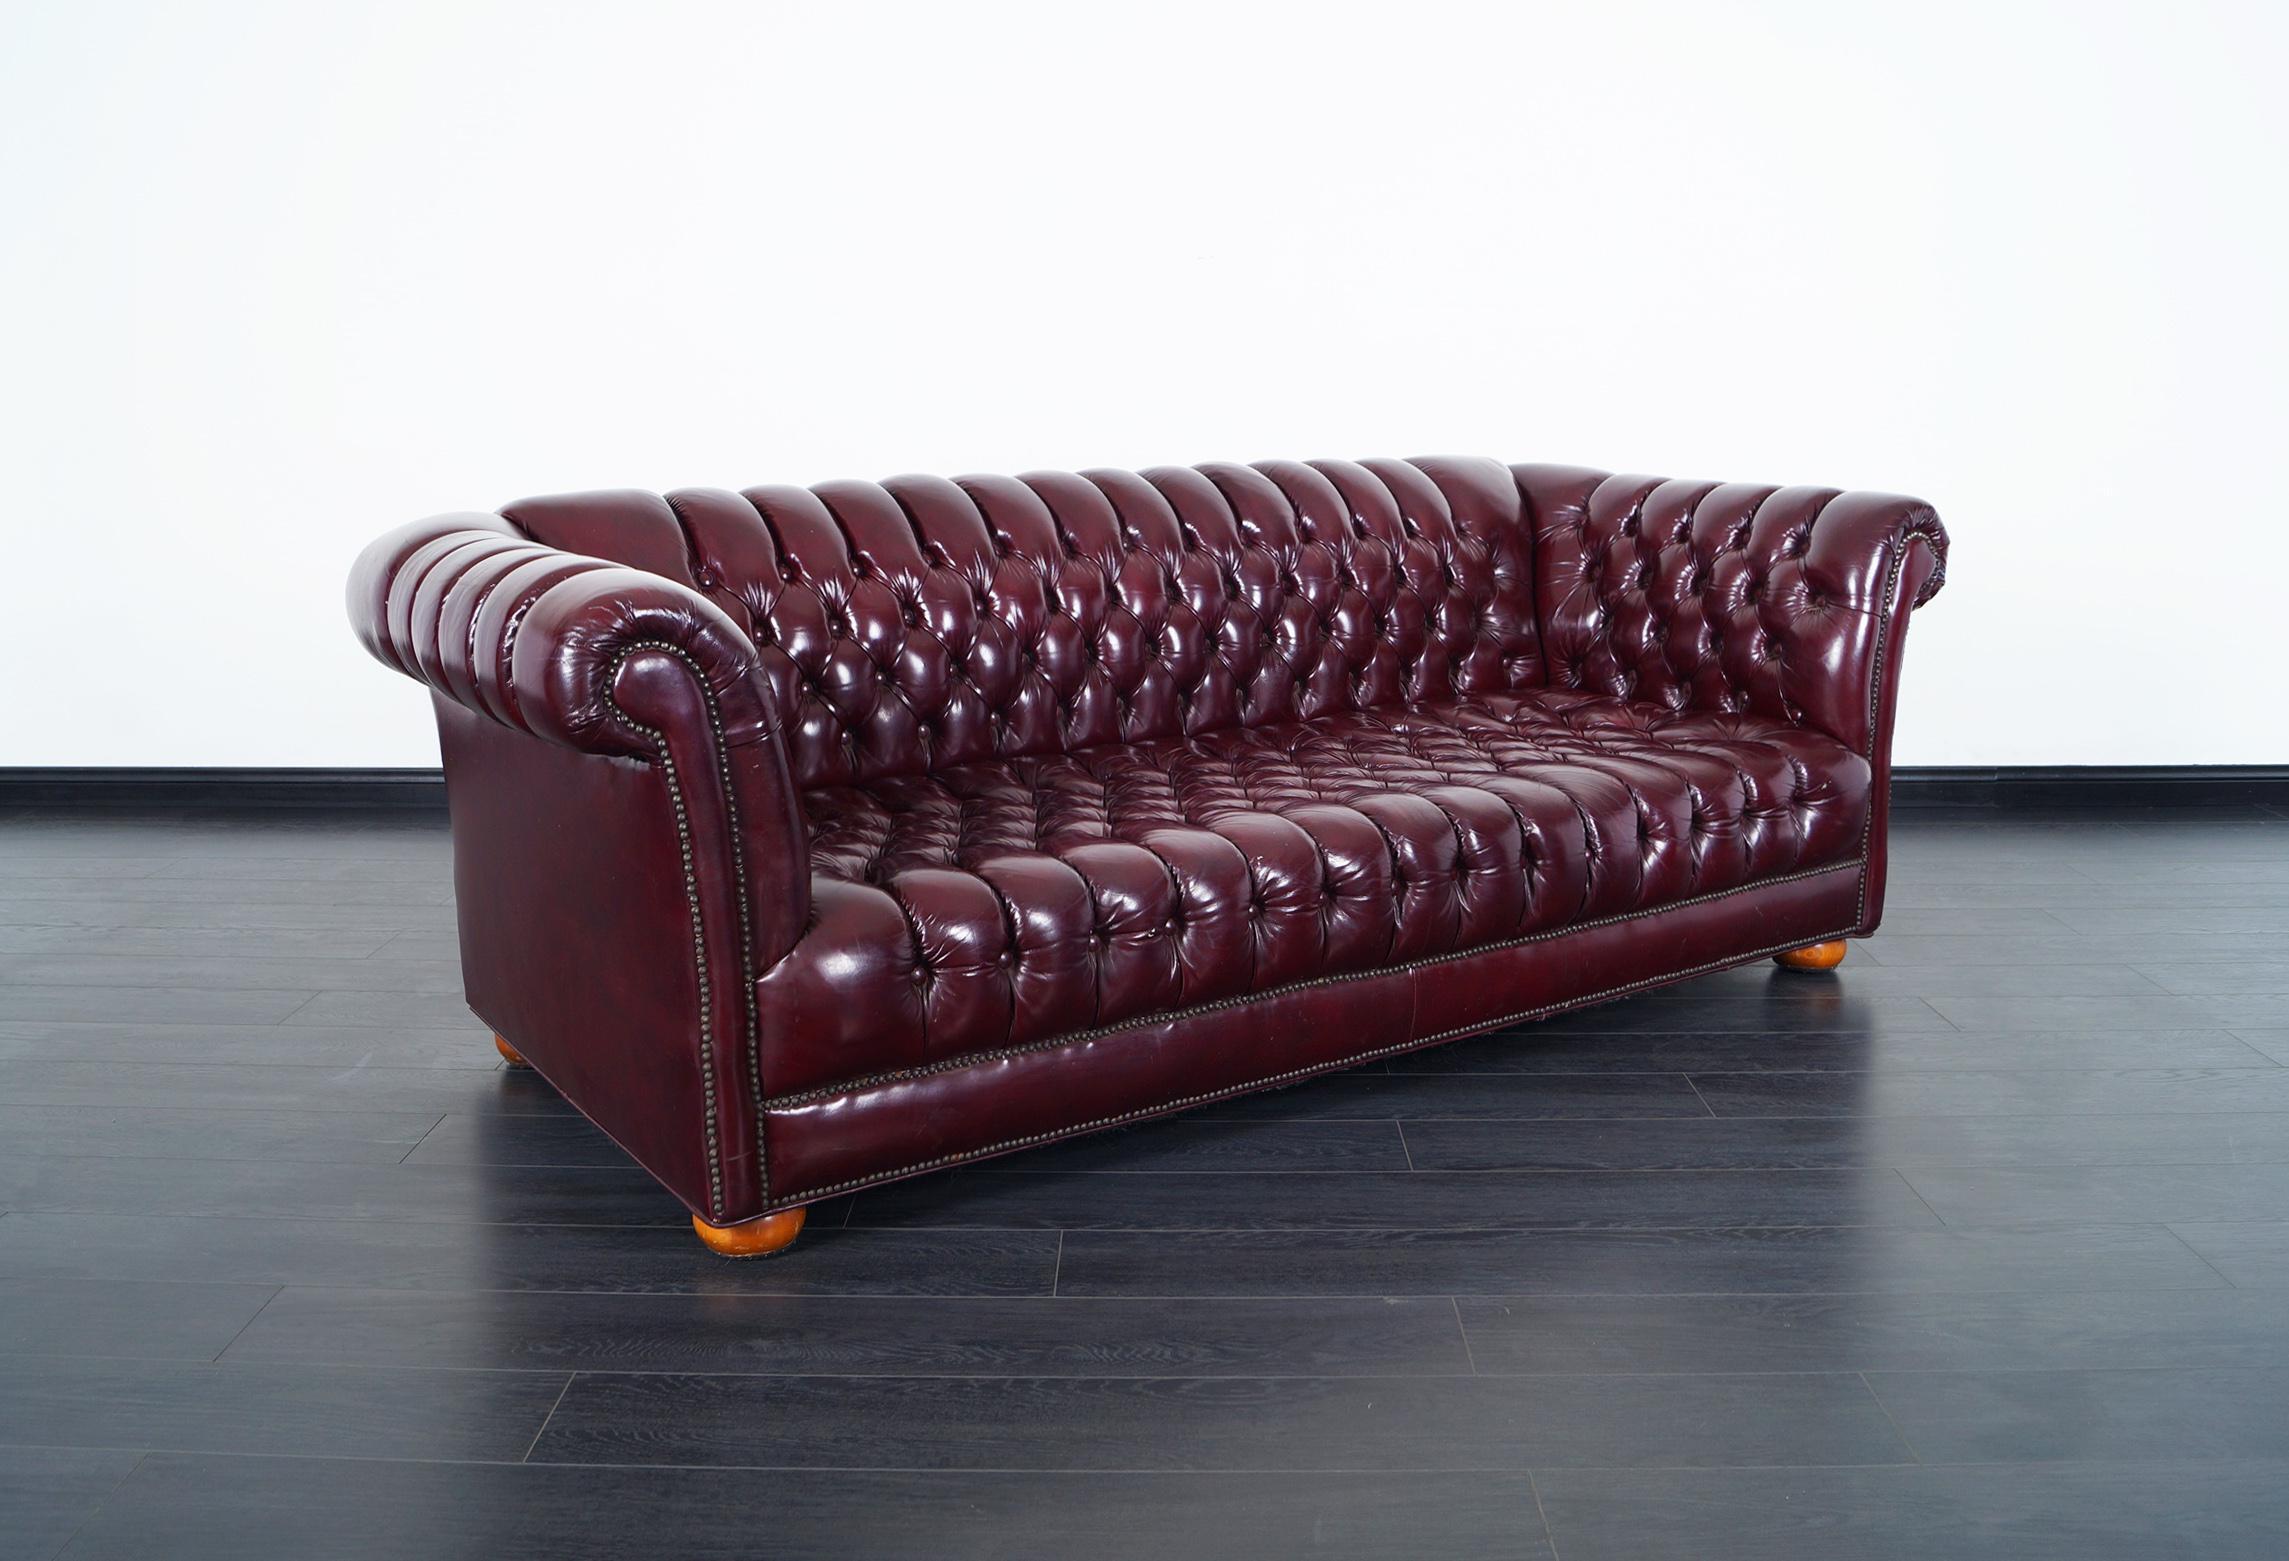 Superieur Fabulous Vintage Burgundy Leather Chesterfield Sofa.